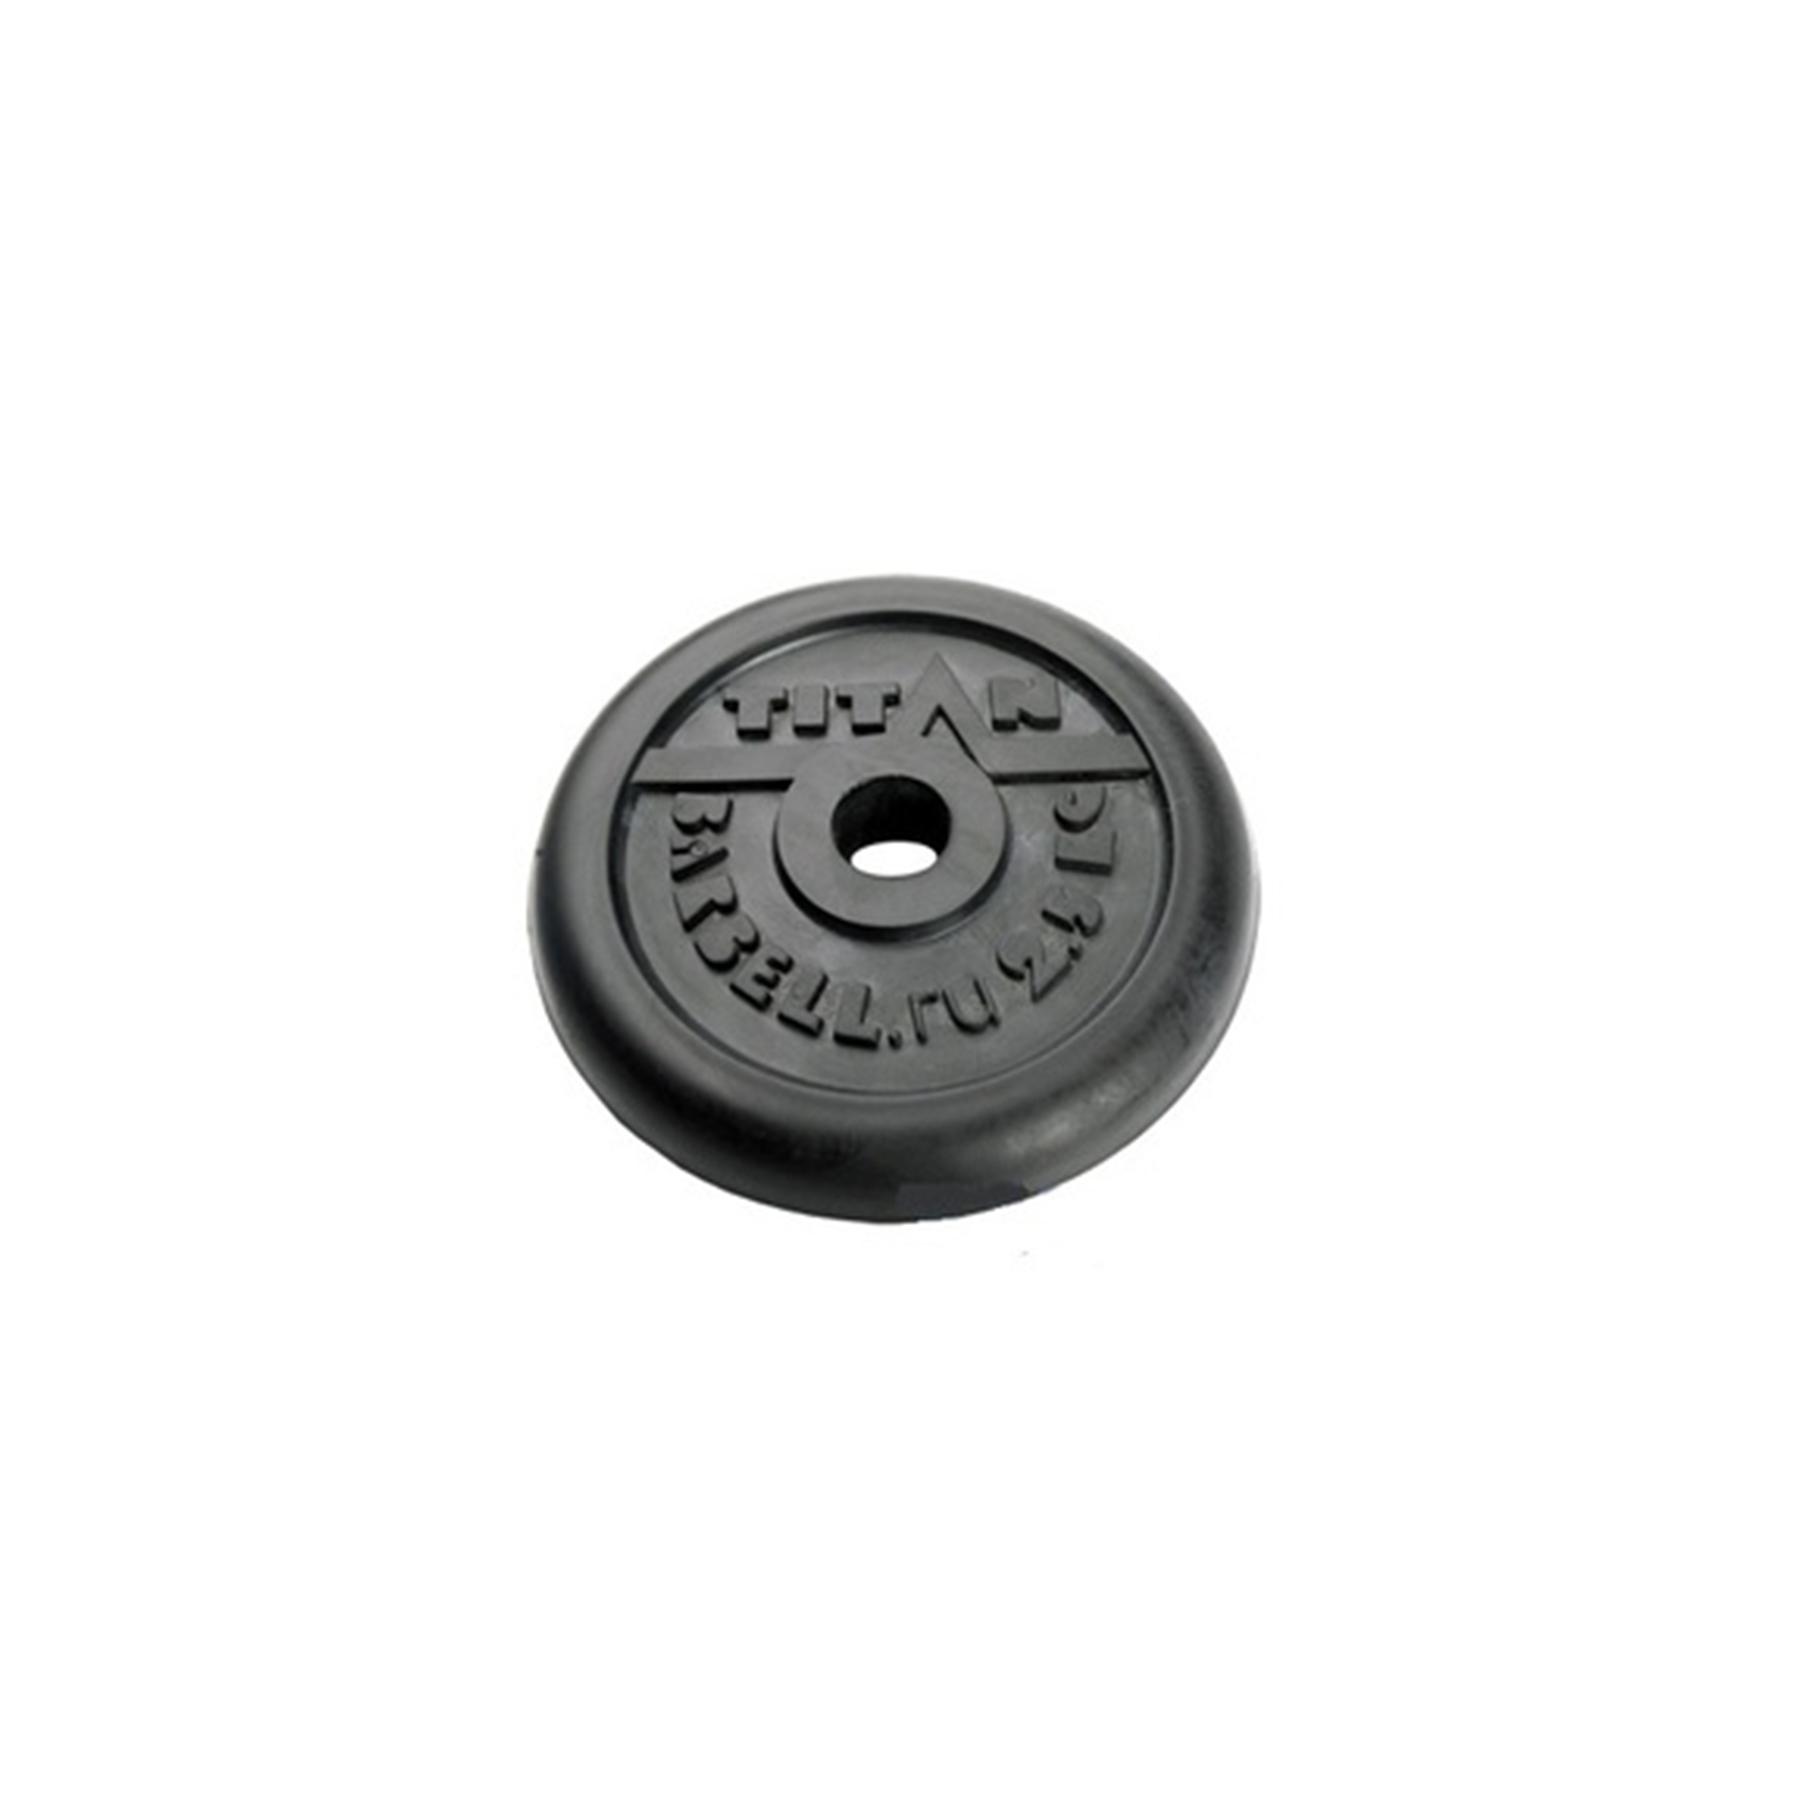 Диск обрез.чер. Титан d-26 mm.  2,00 кг.